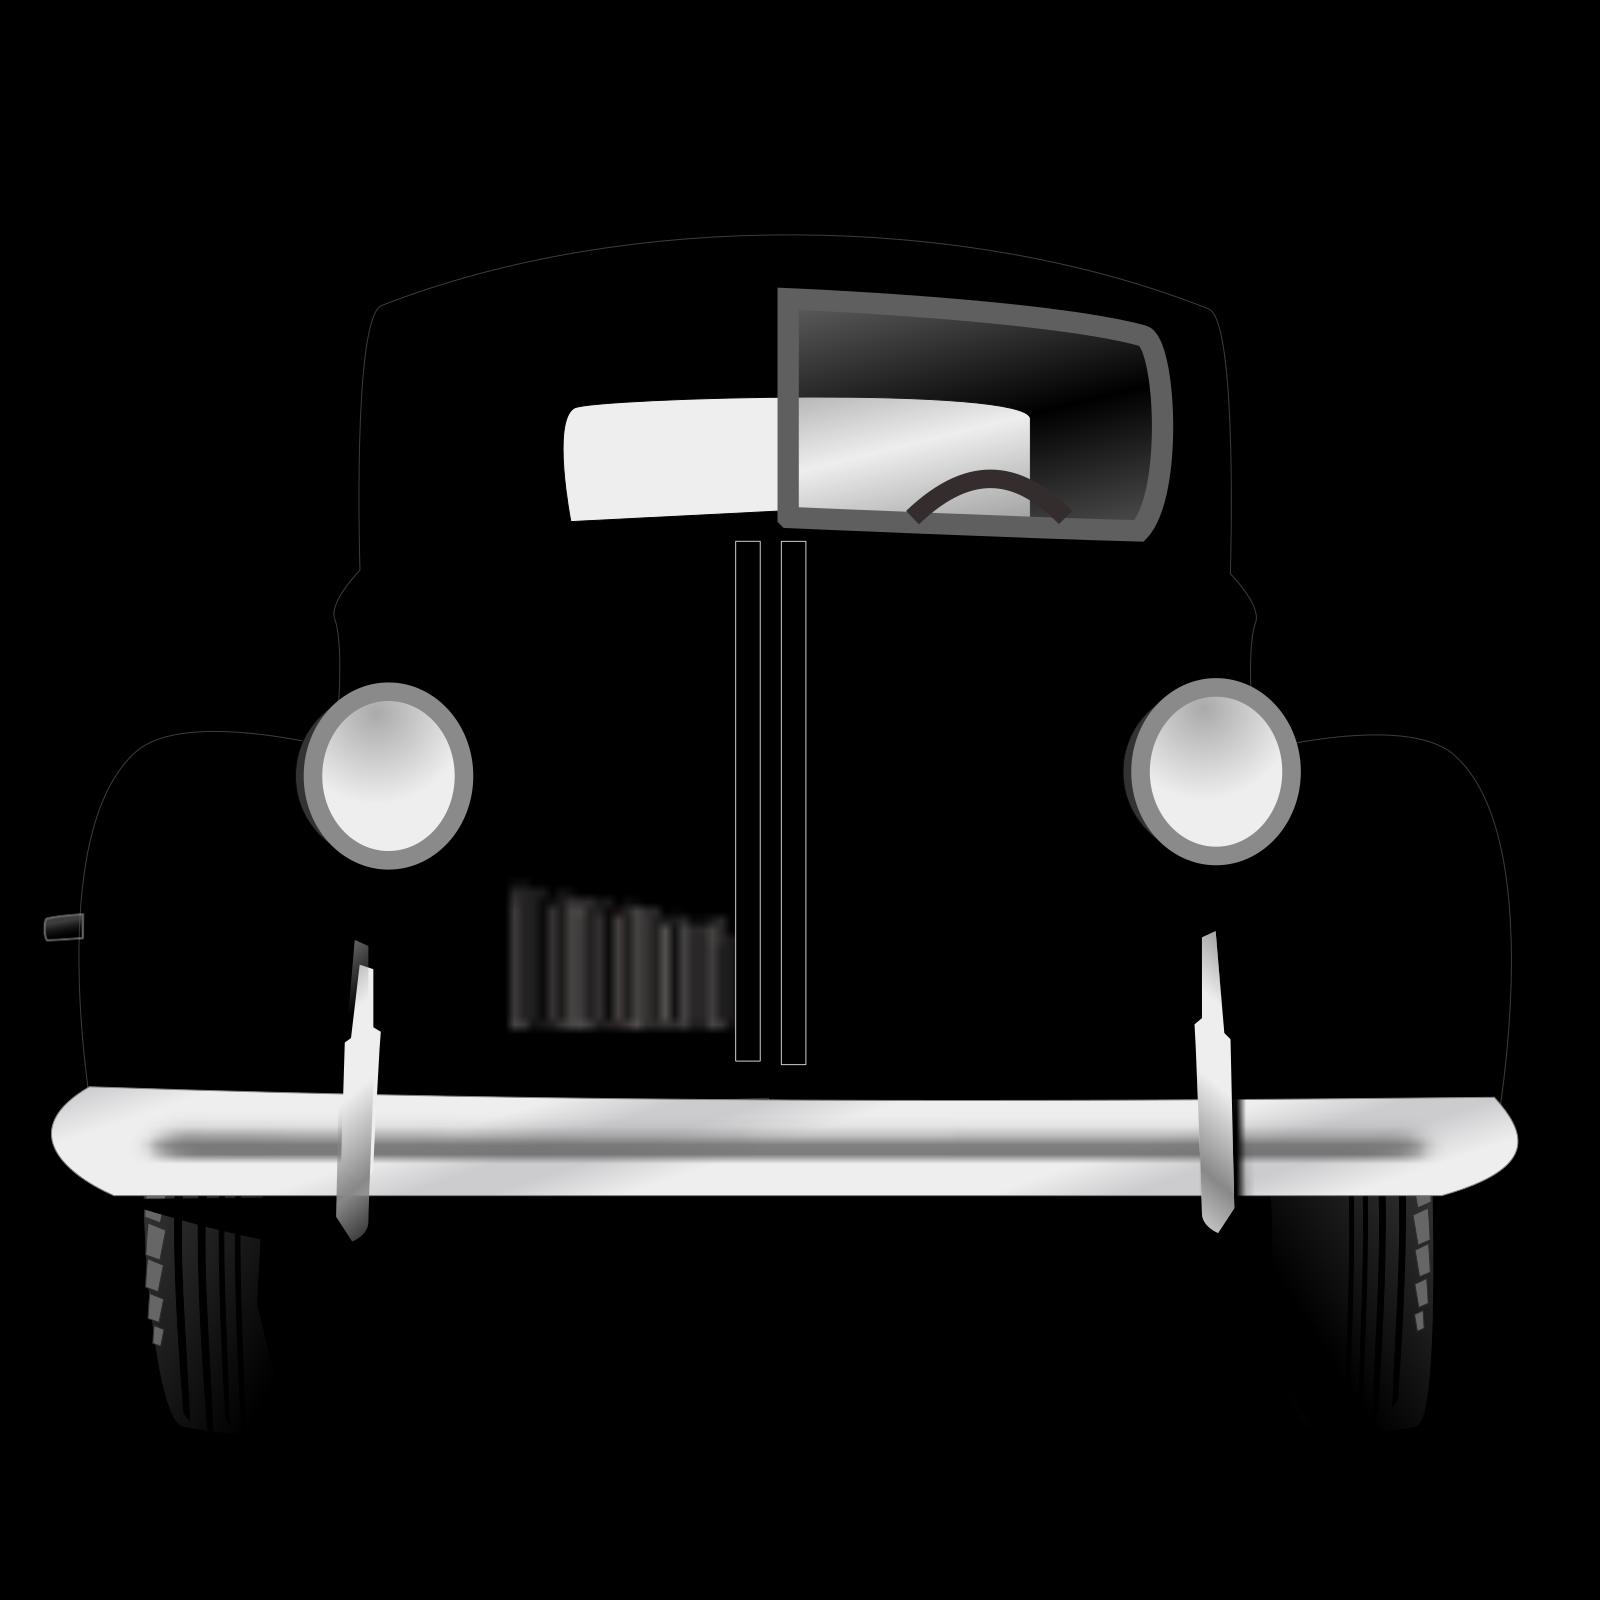 Old Car SVG Clip arts